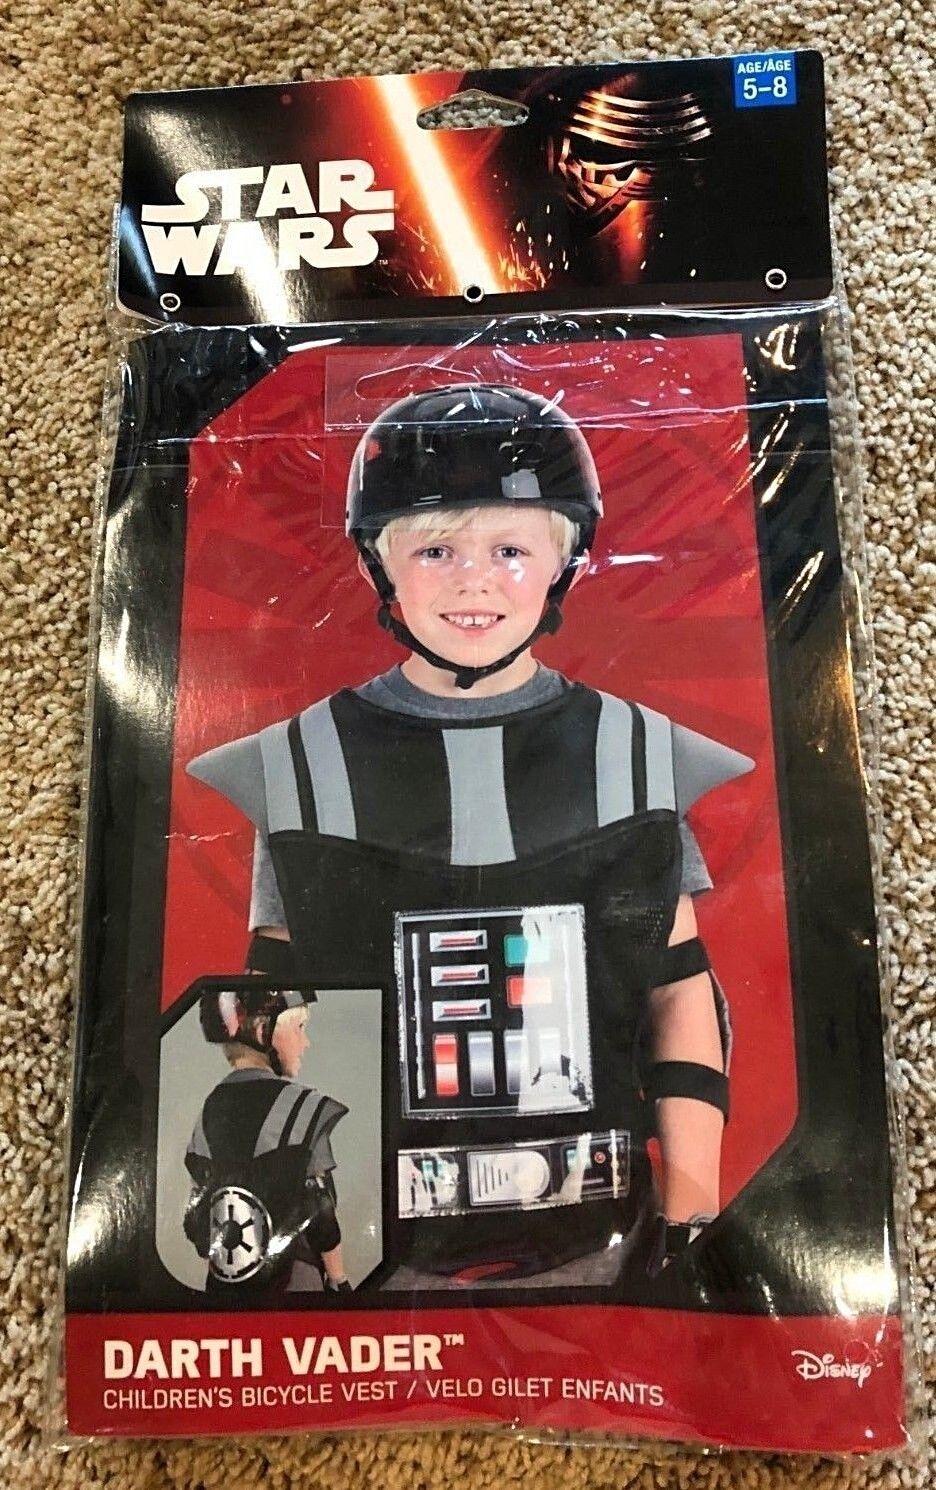 NEW Children/'s bicycle Vest Ages 5-8 Retails $12.99 Star Wars Darth Vader